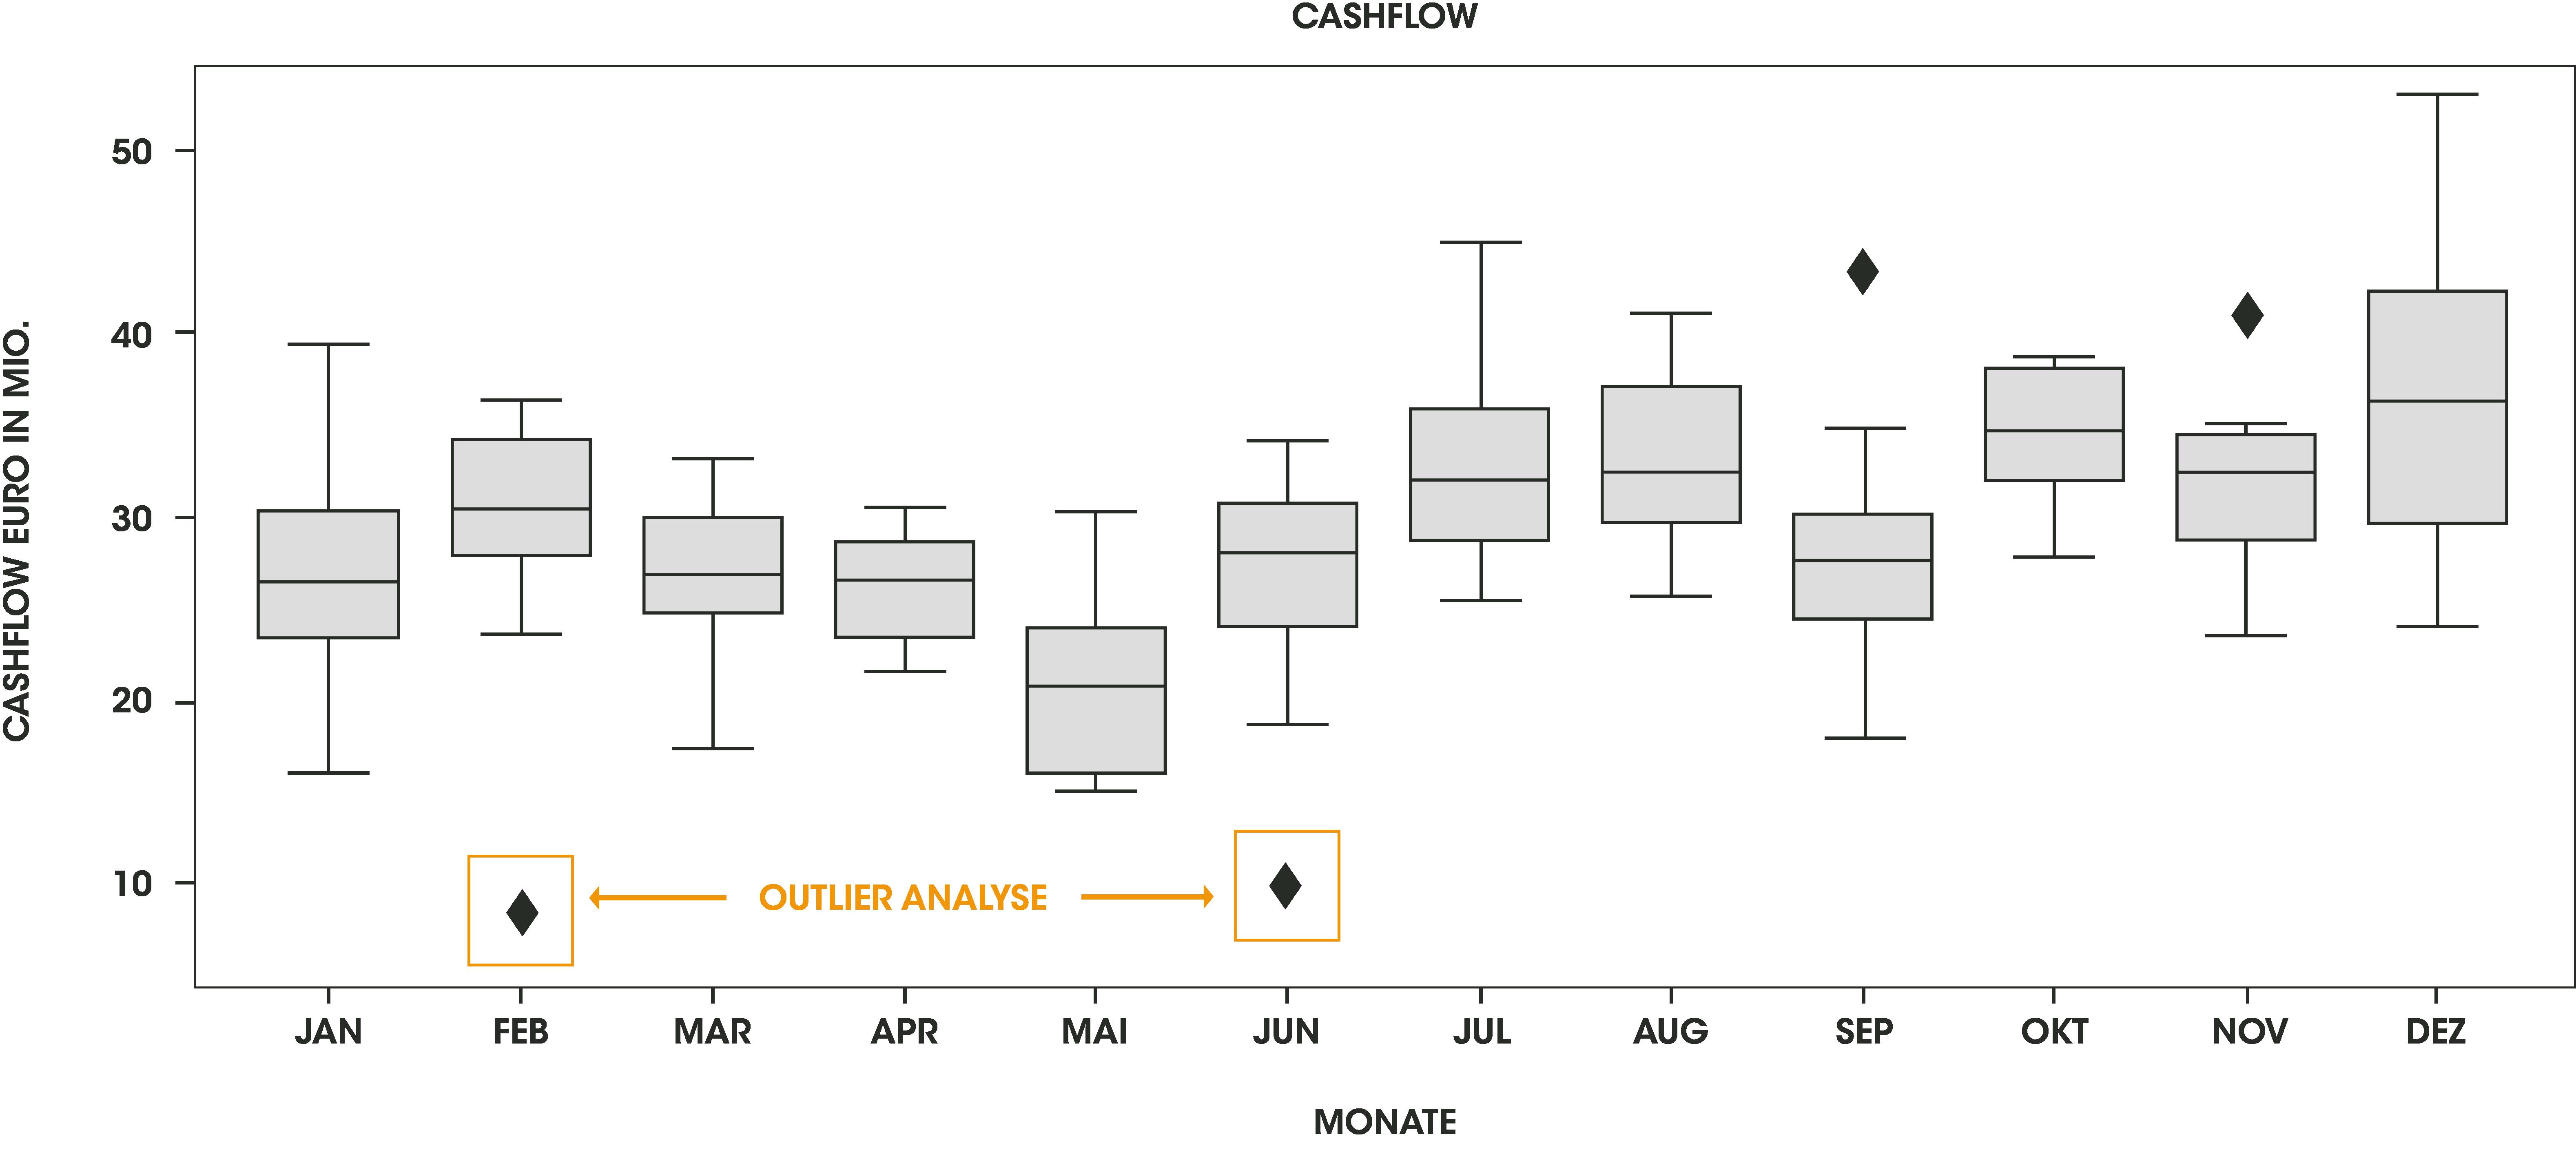 LiquiForecast Cashflow